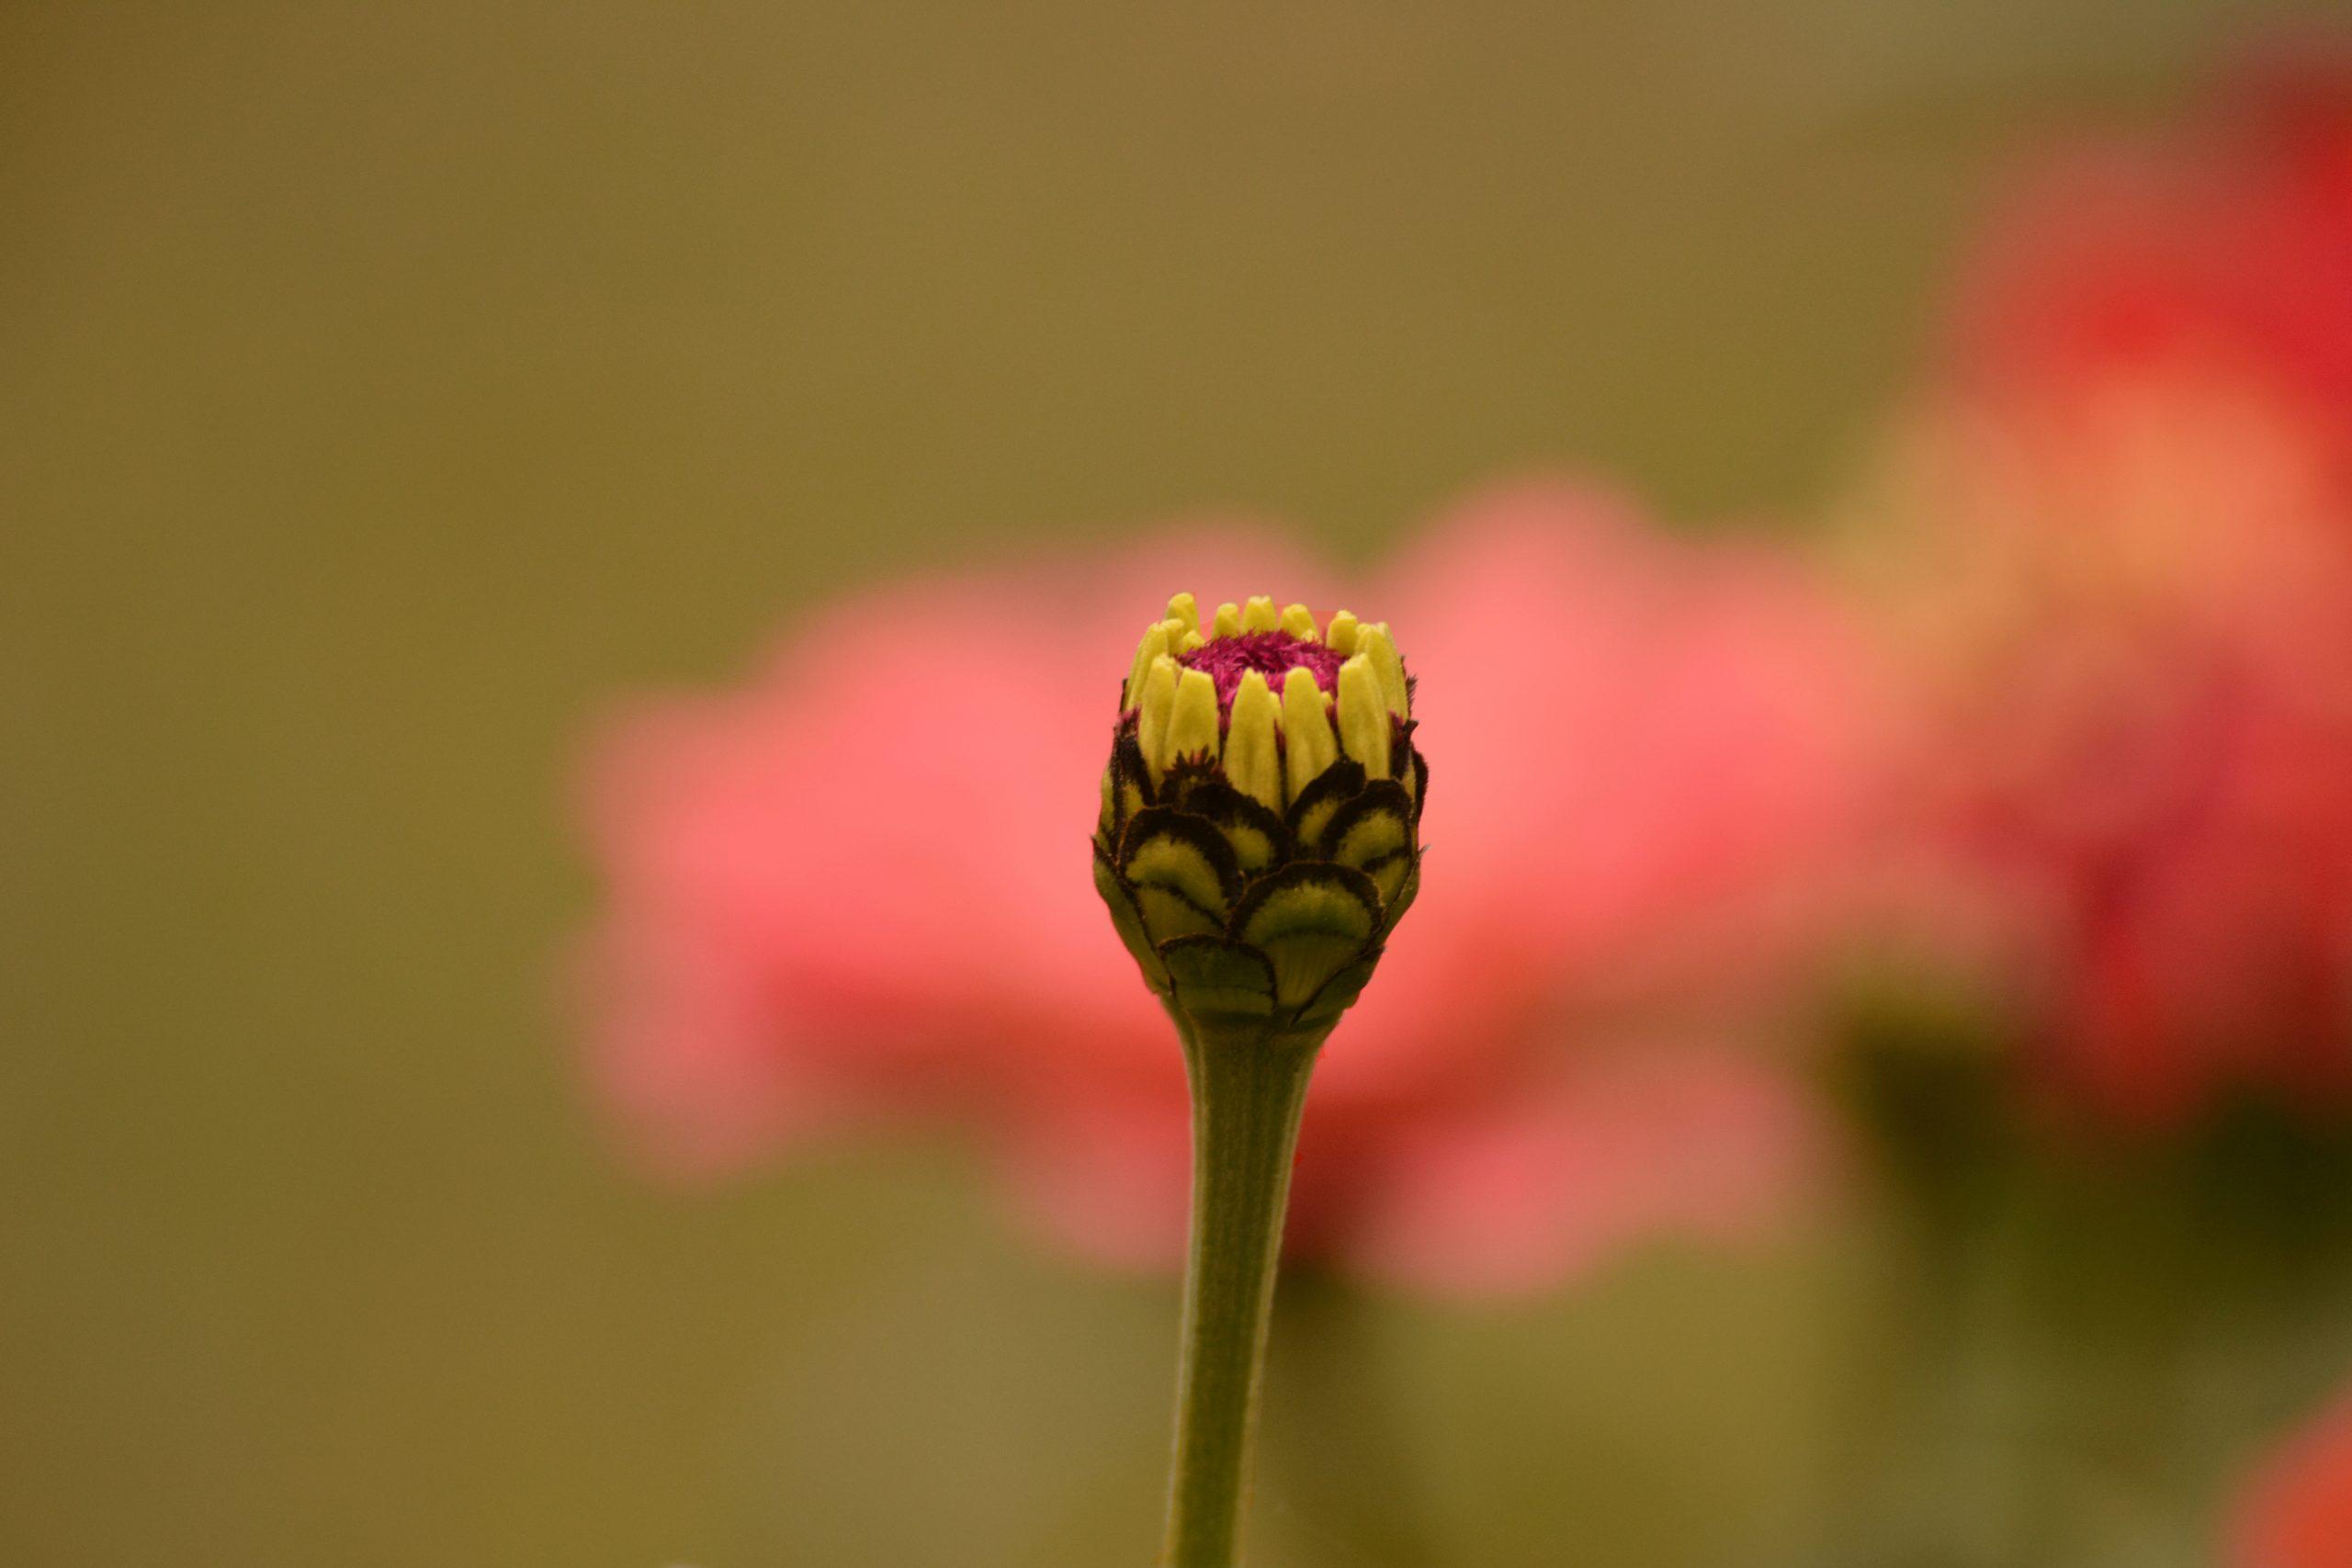 Beautiful flower bud